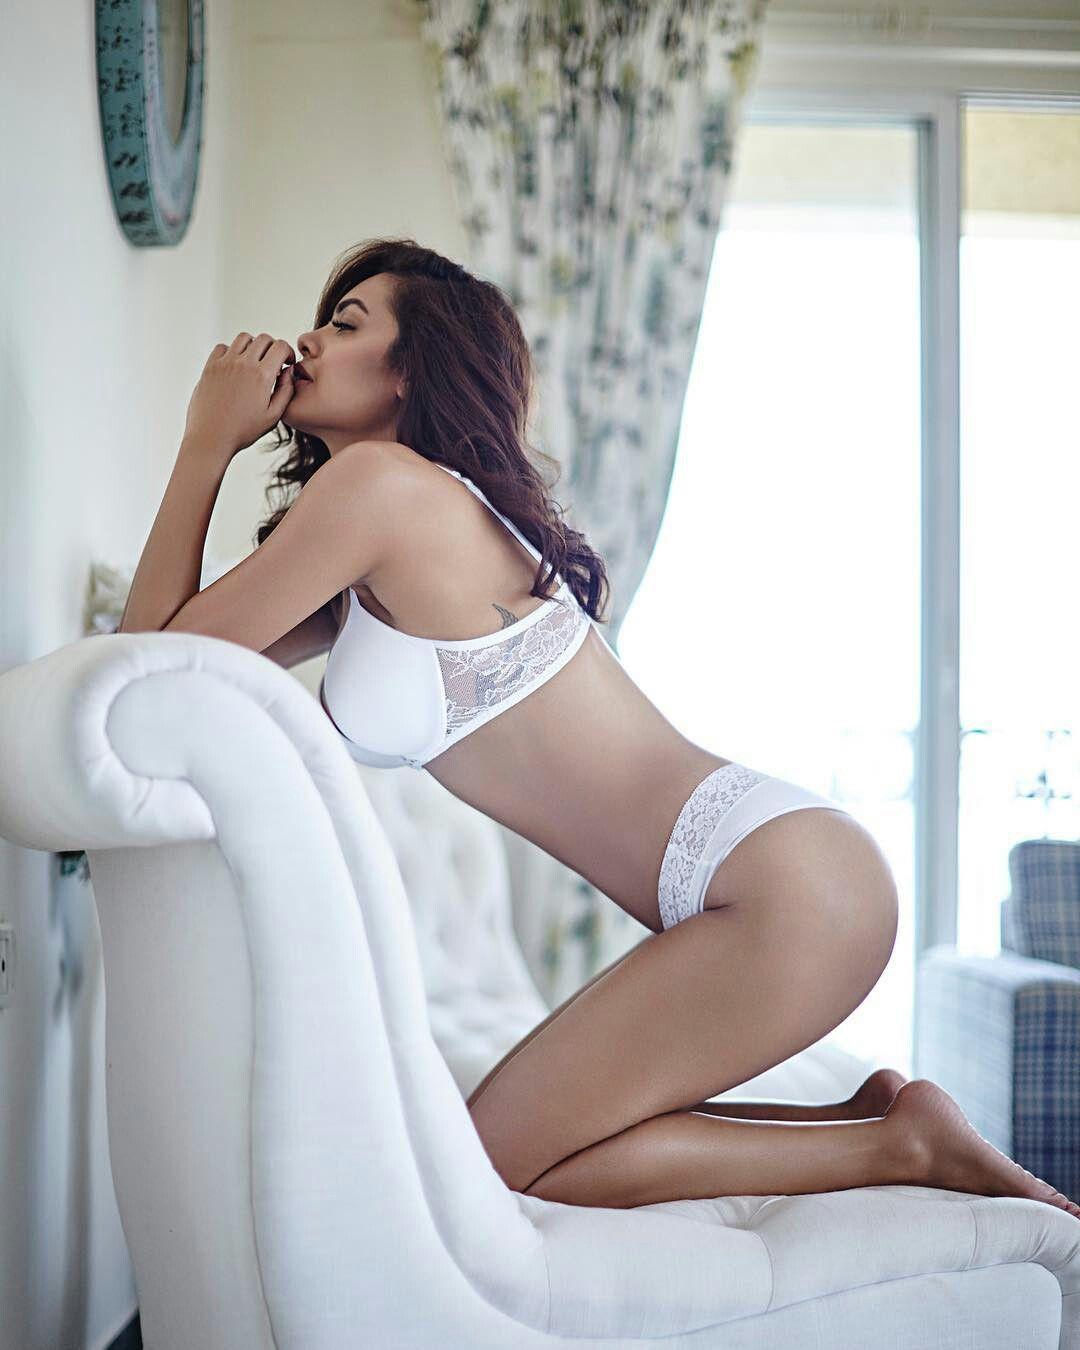 monster-cock-fhm-girls-indian-saree-girl-next-door-semi-nude-pussy